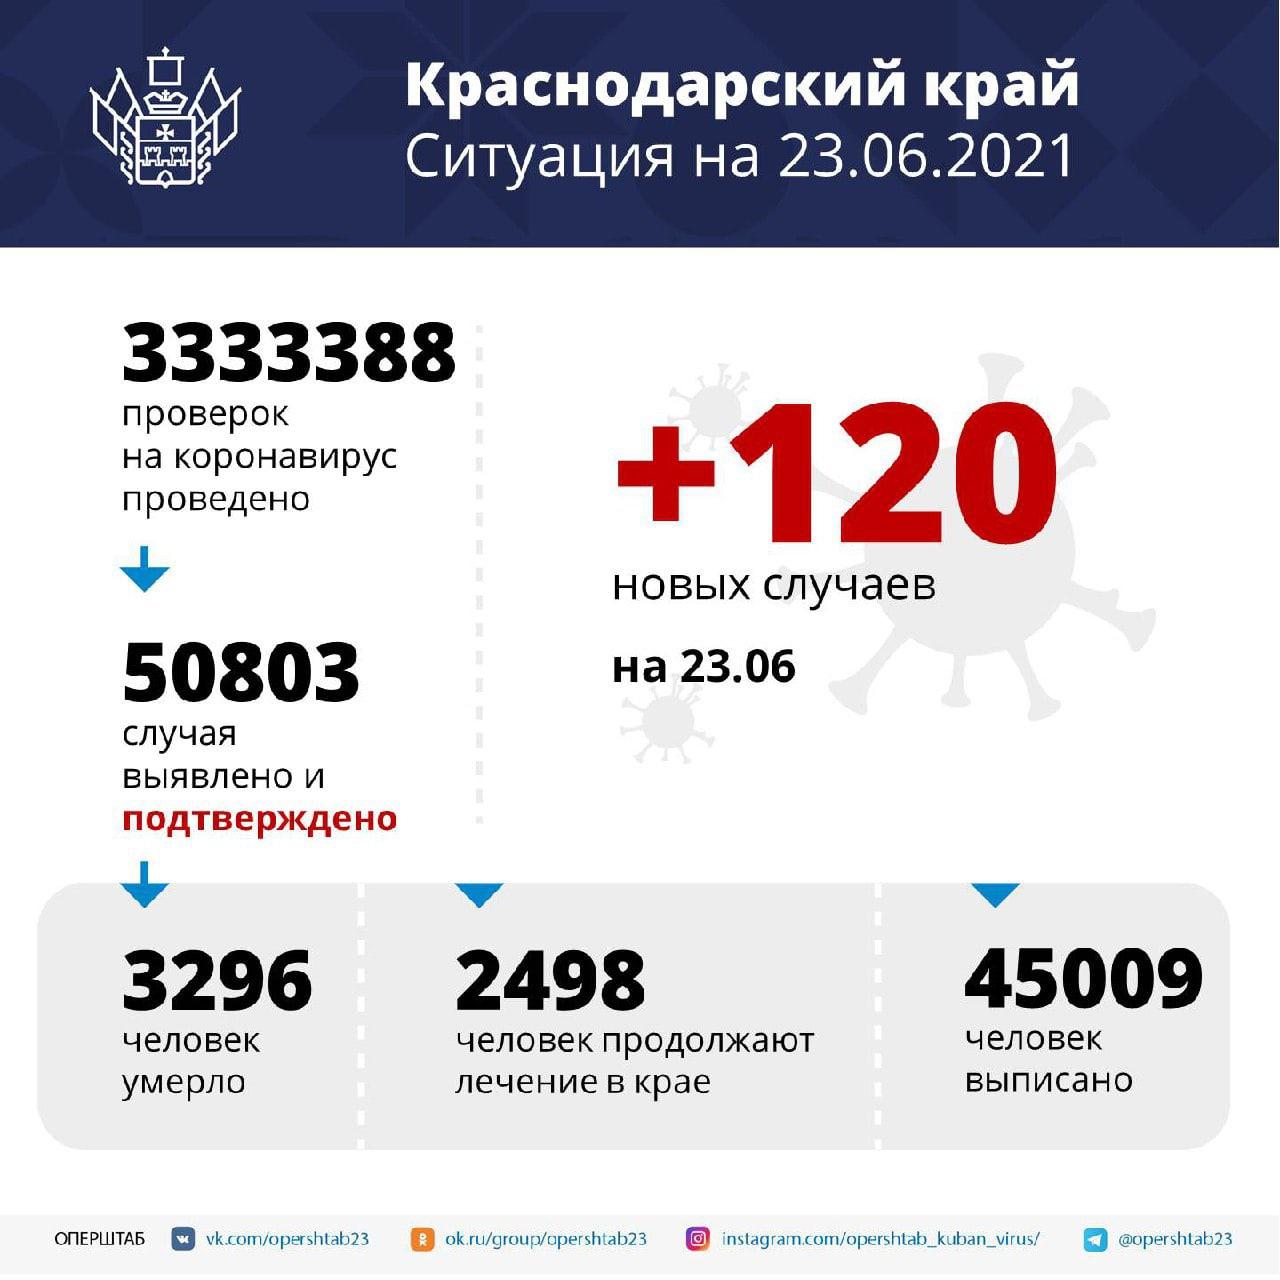 На Кубани за сутки зарегистрировали 120 случаев COVID-19Заболевших...